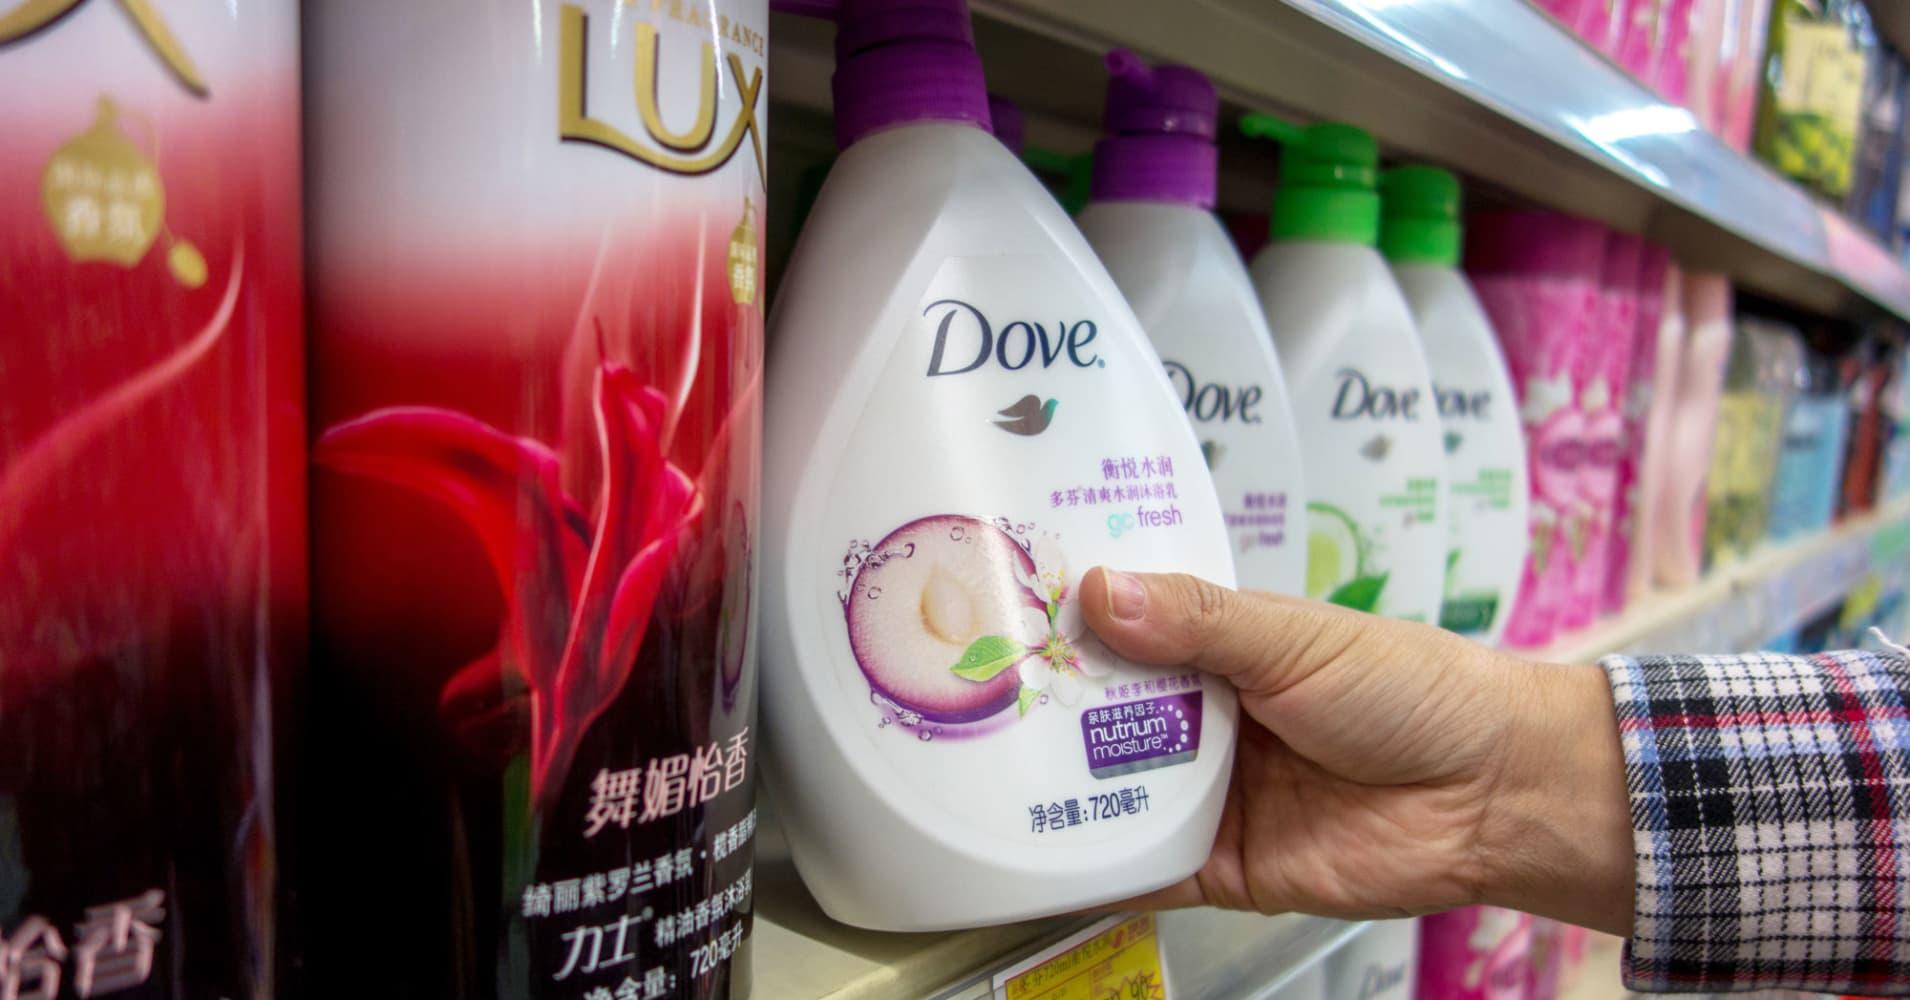 Analyst sees 75 percent chance Kraft Heinz will revisit Unilever with hostile bid